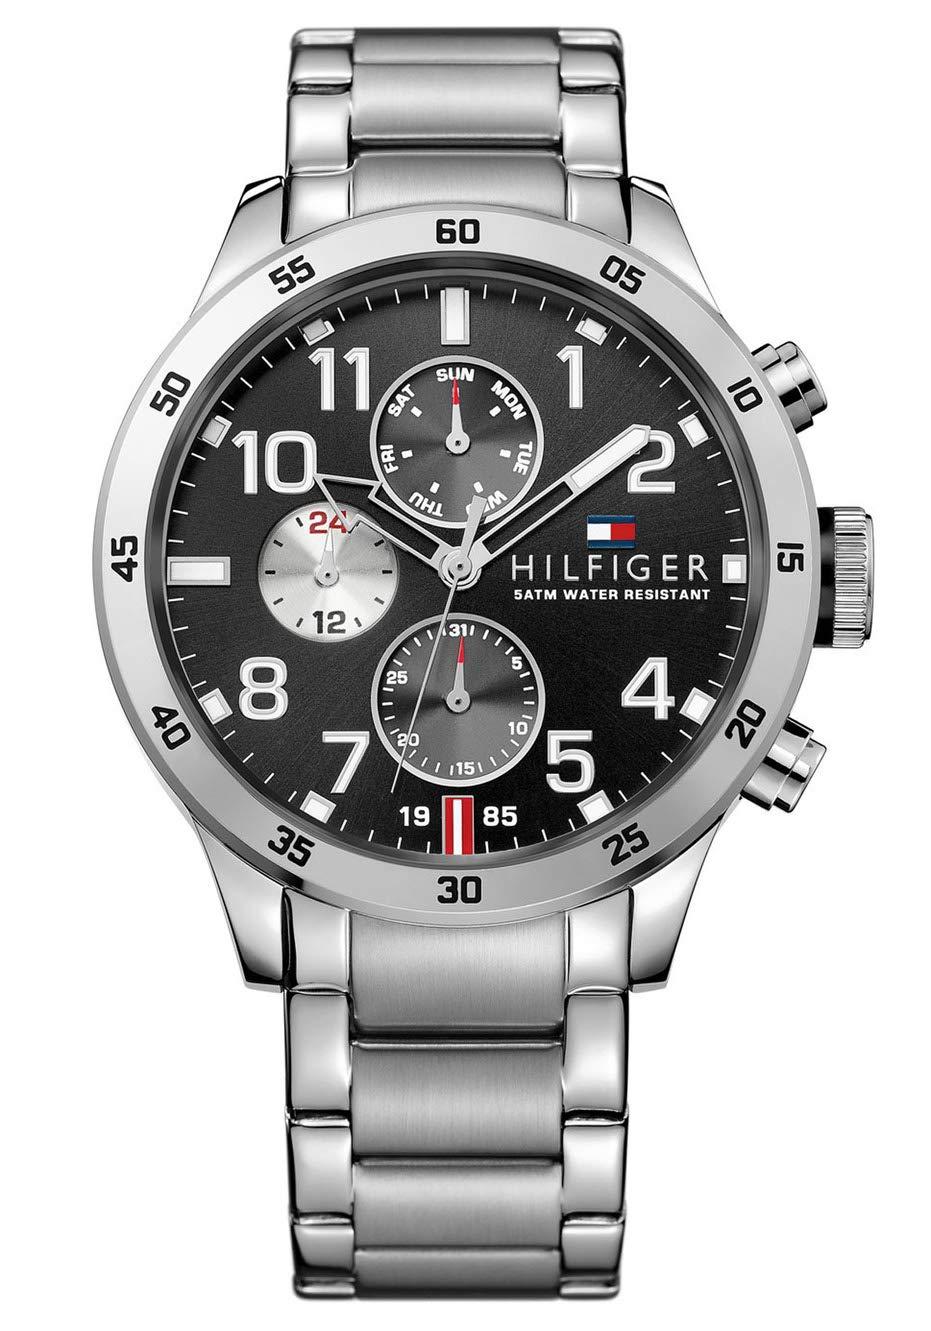 Tommy-Hilfiger-Herren-Analog-Quarz-Uhr-mit-Edelstahl-Armband-1791141